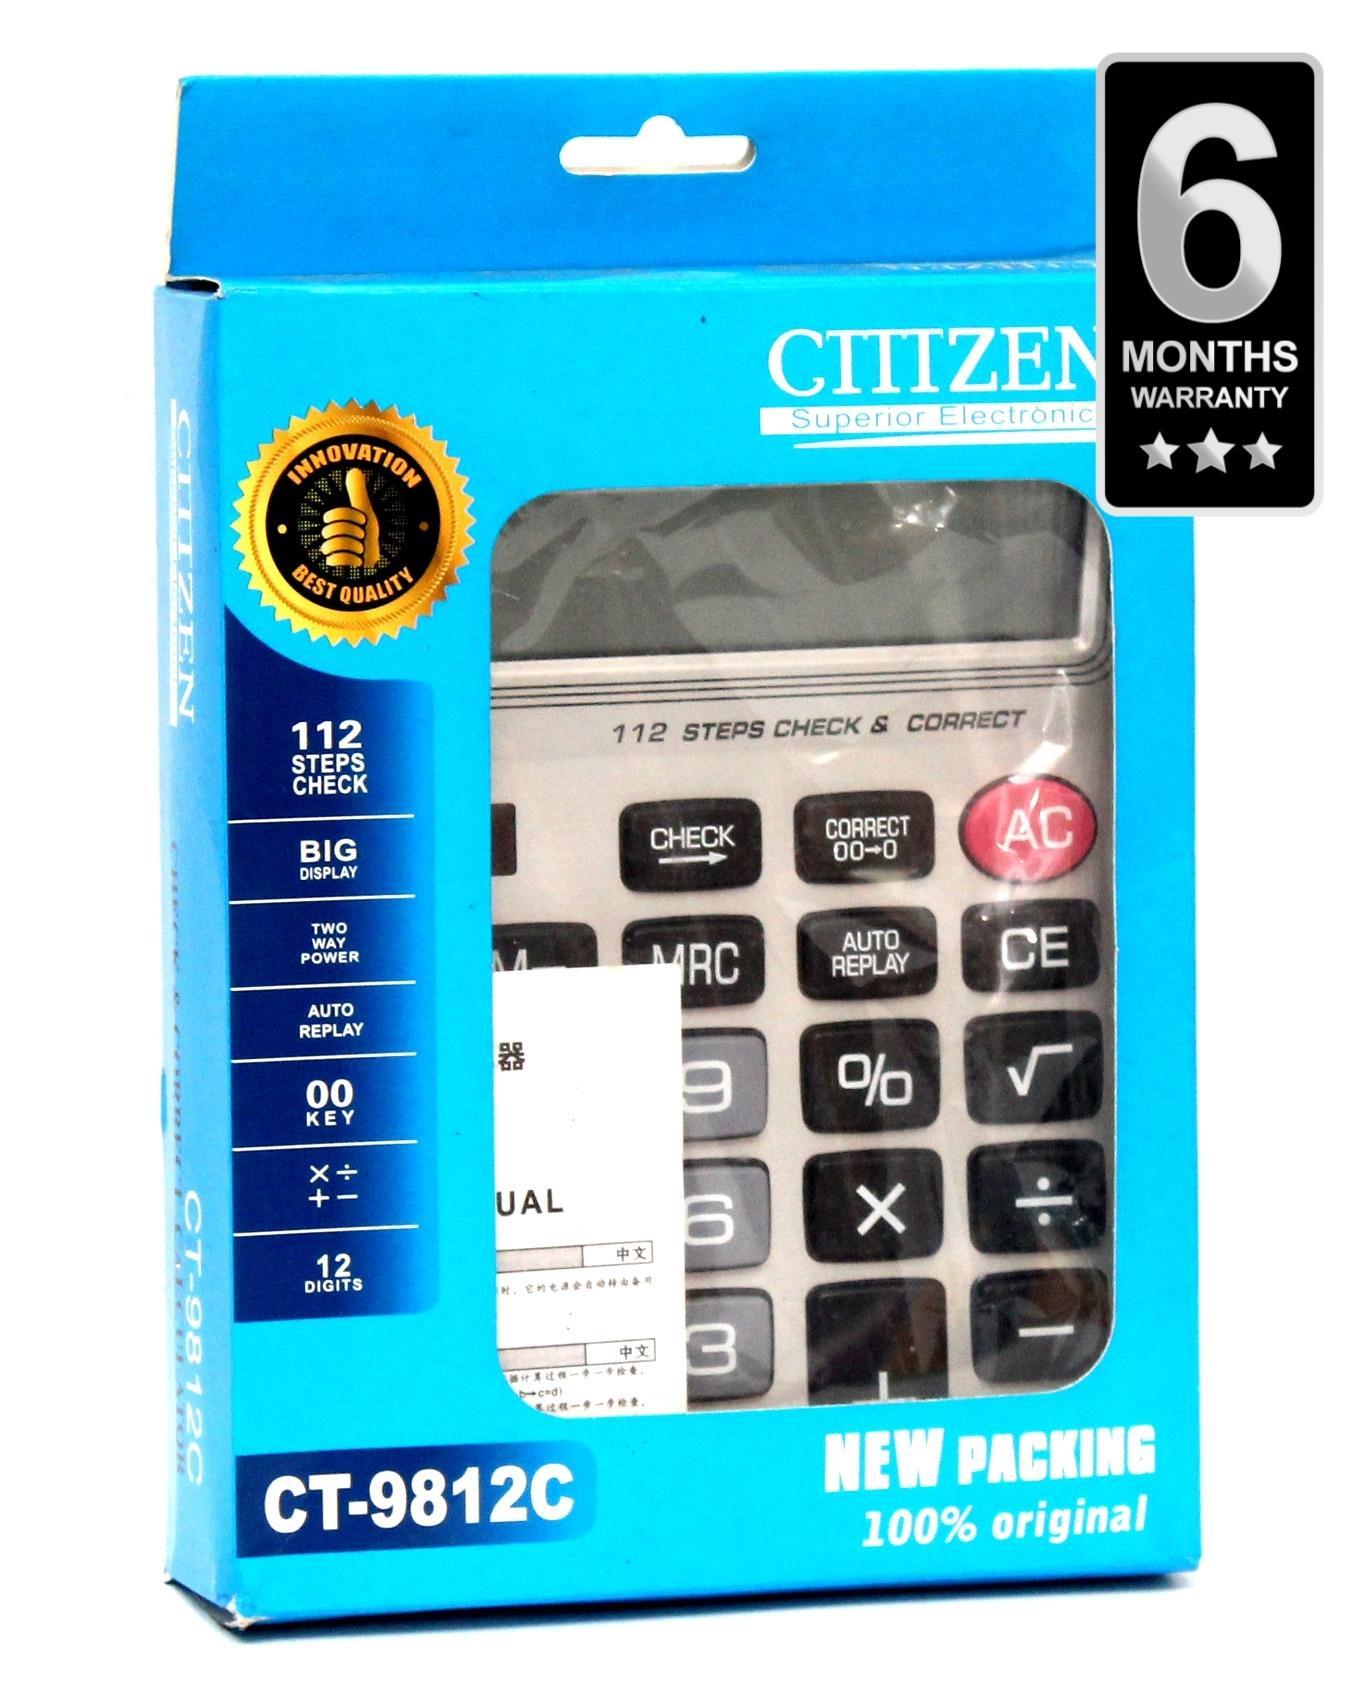 Buy Citizen Home Calculators At Best Prices Online In Sri Lanka Calculator